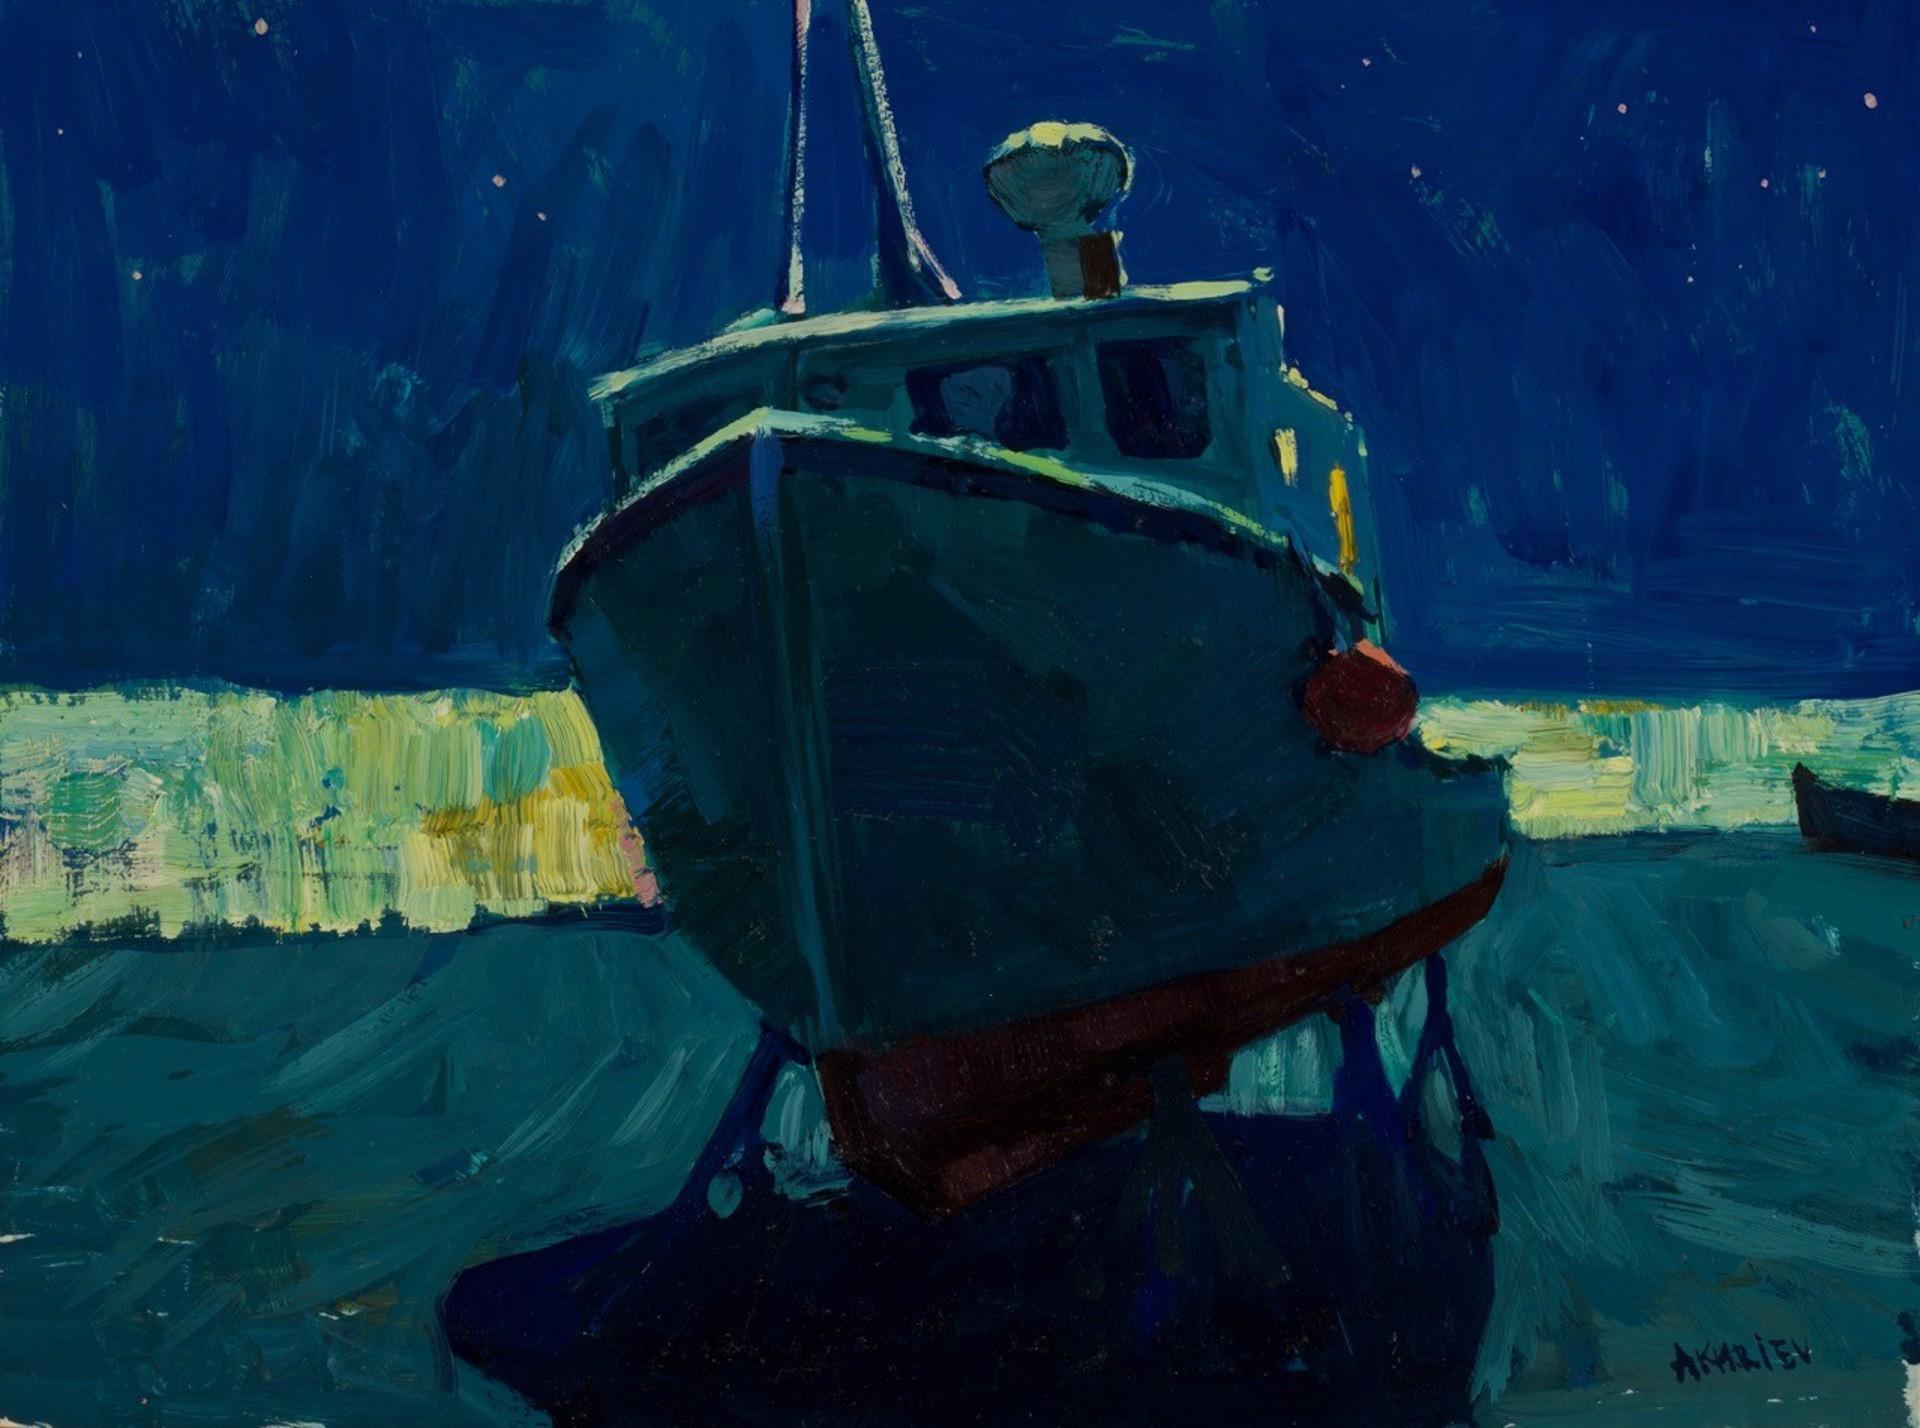 Off Track by Timur Akhriev